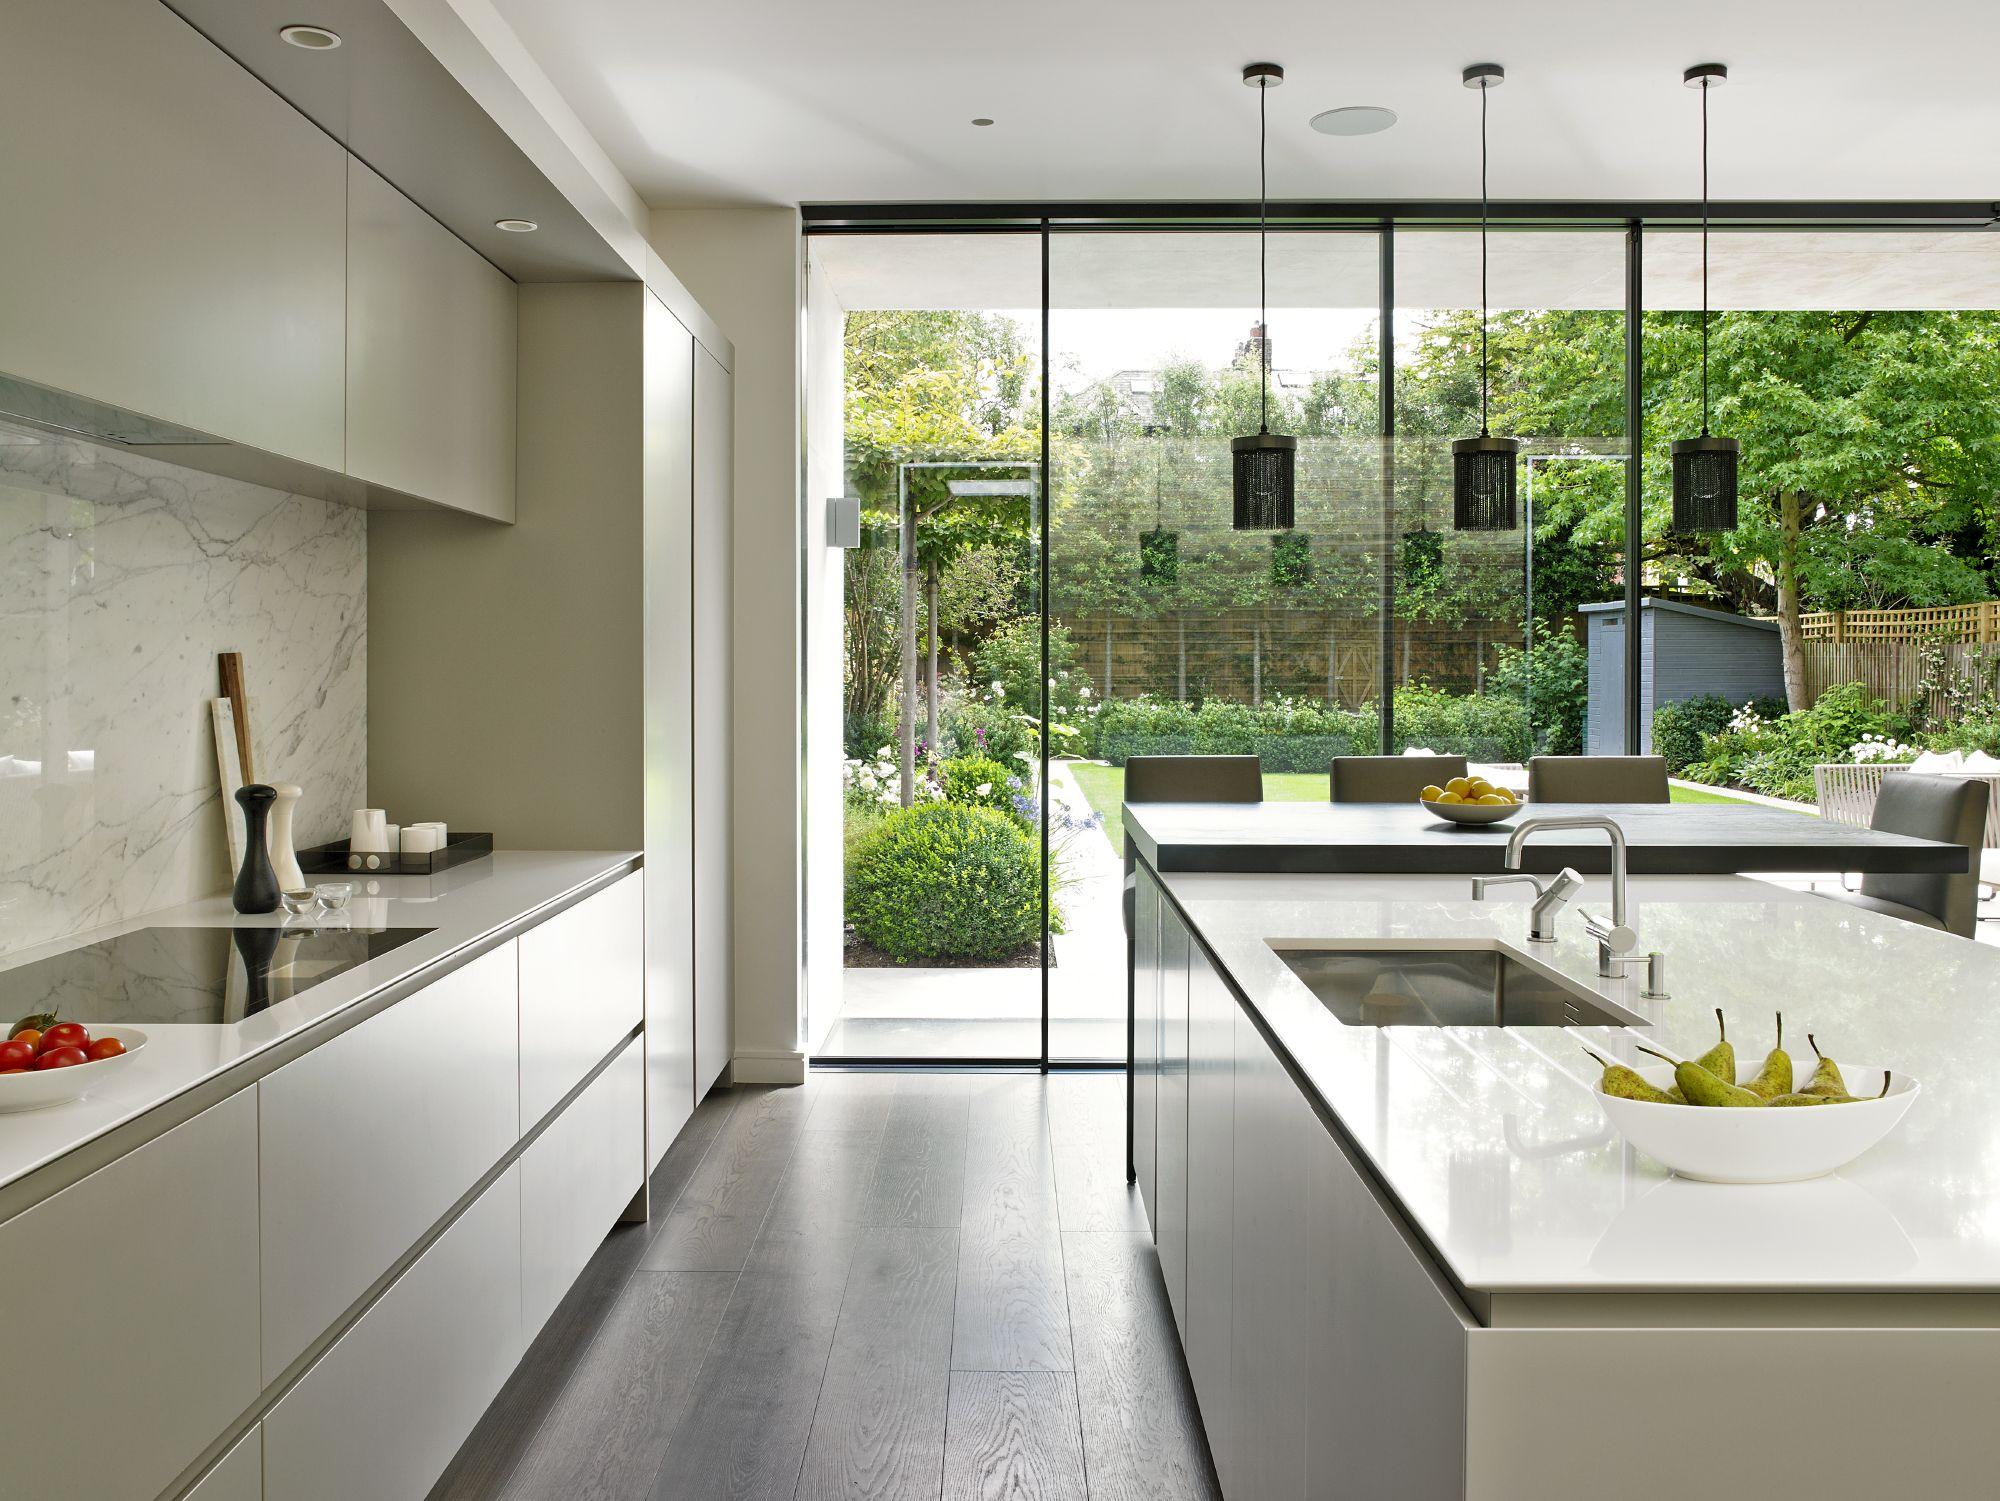 Wandsworth family kitchen bespoke kitchens sw london minimalist